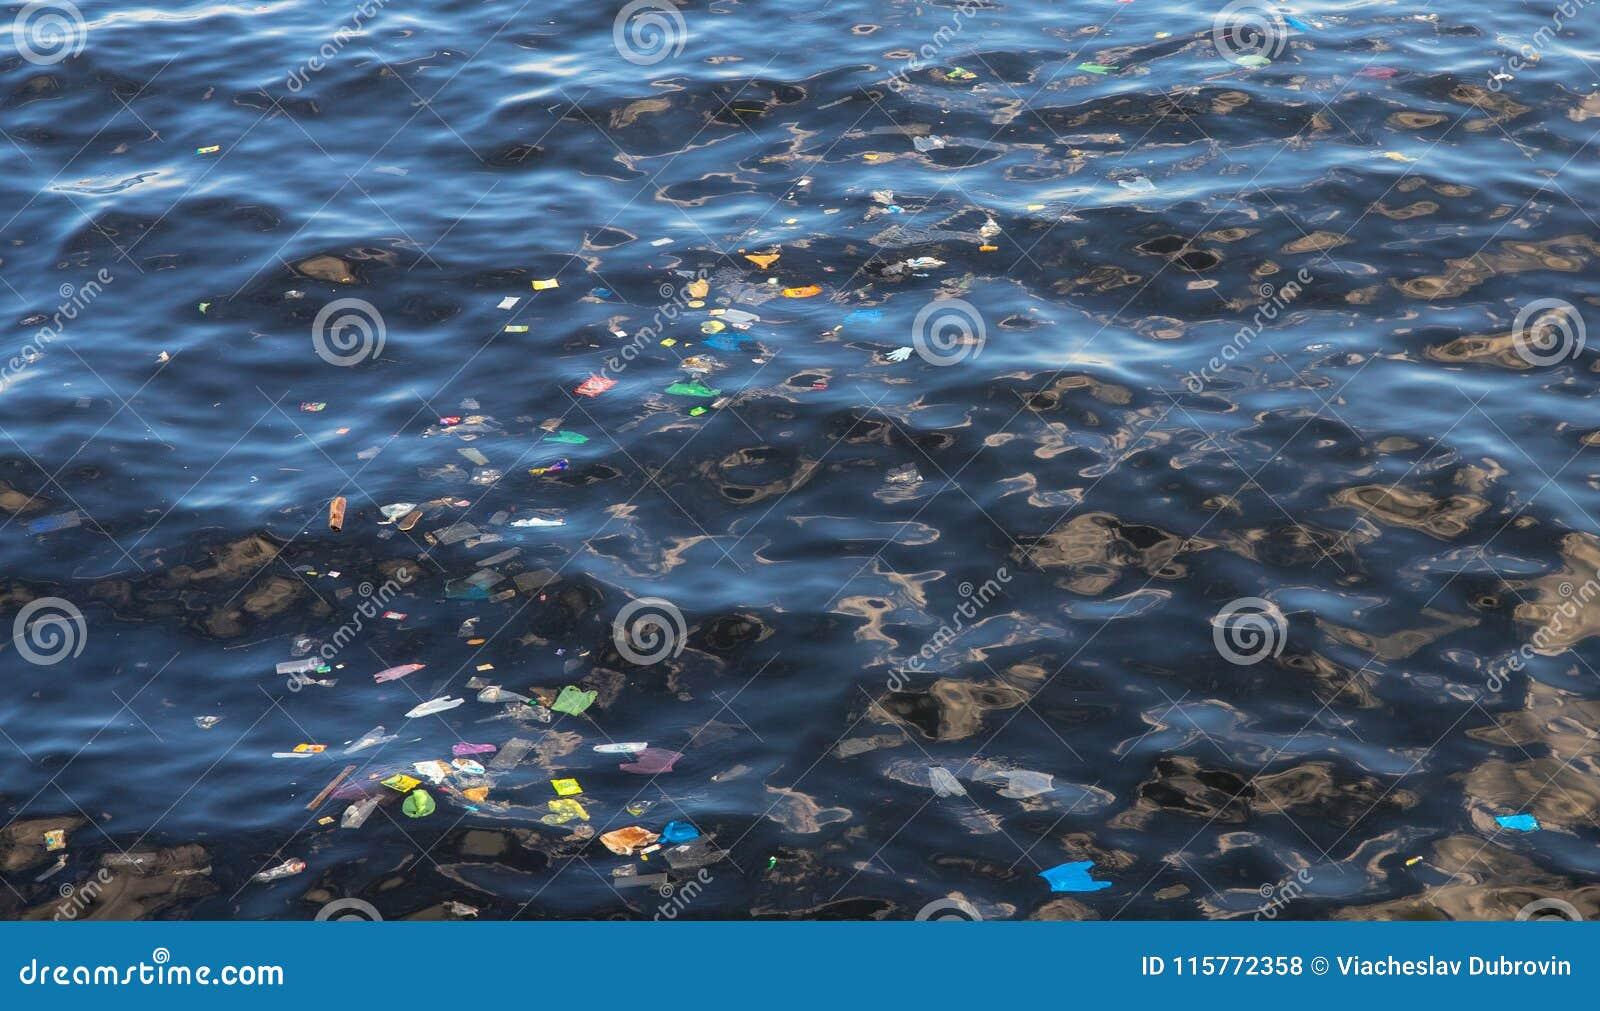 Garbage in sea water. Plastic trash in ocean. Ecological problem. Urban seaside pollution